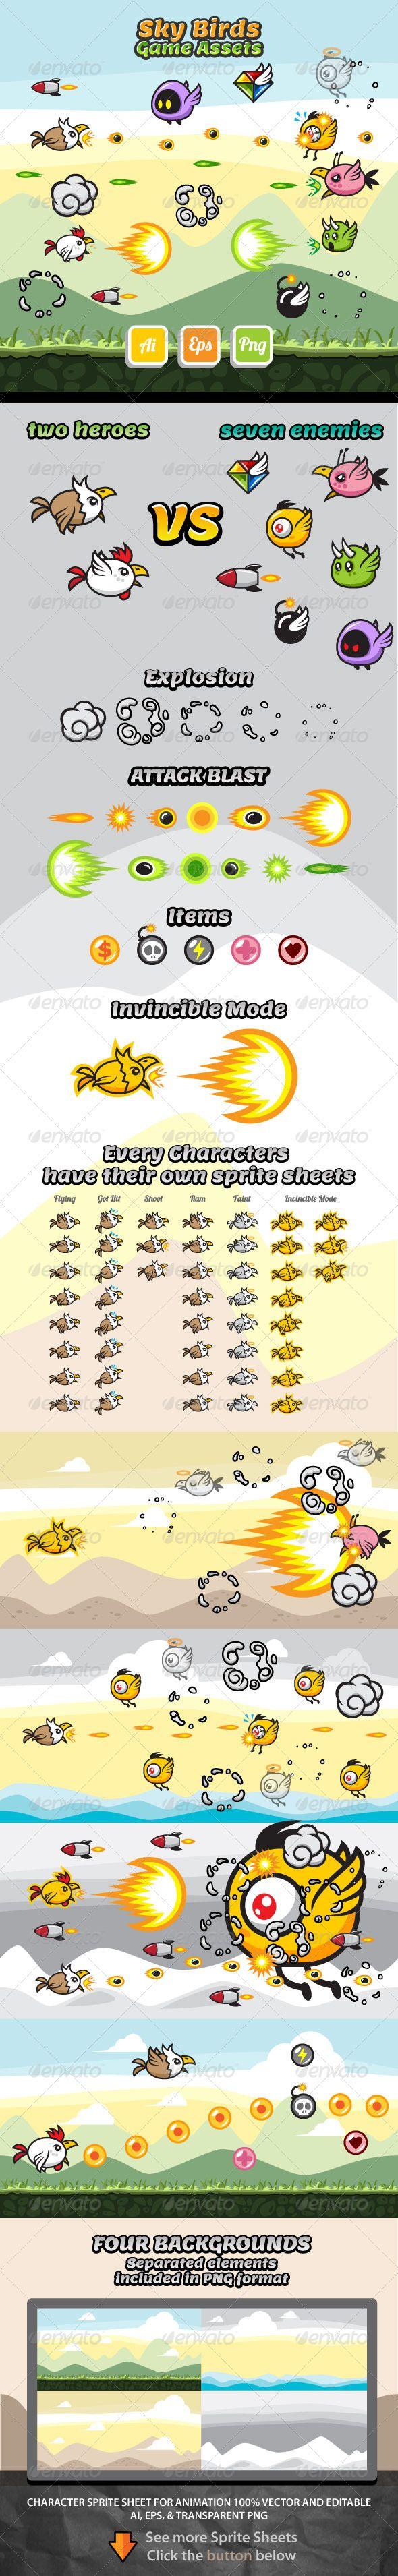 Sky Birds Game Assets - Download: http://graphicriver.net/item/sky-birds-game-assets/7127737?ref=sinzo #Sprites #Game #Assets